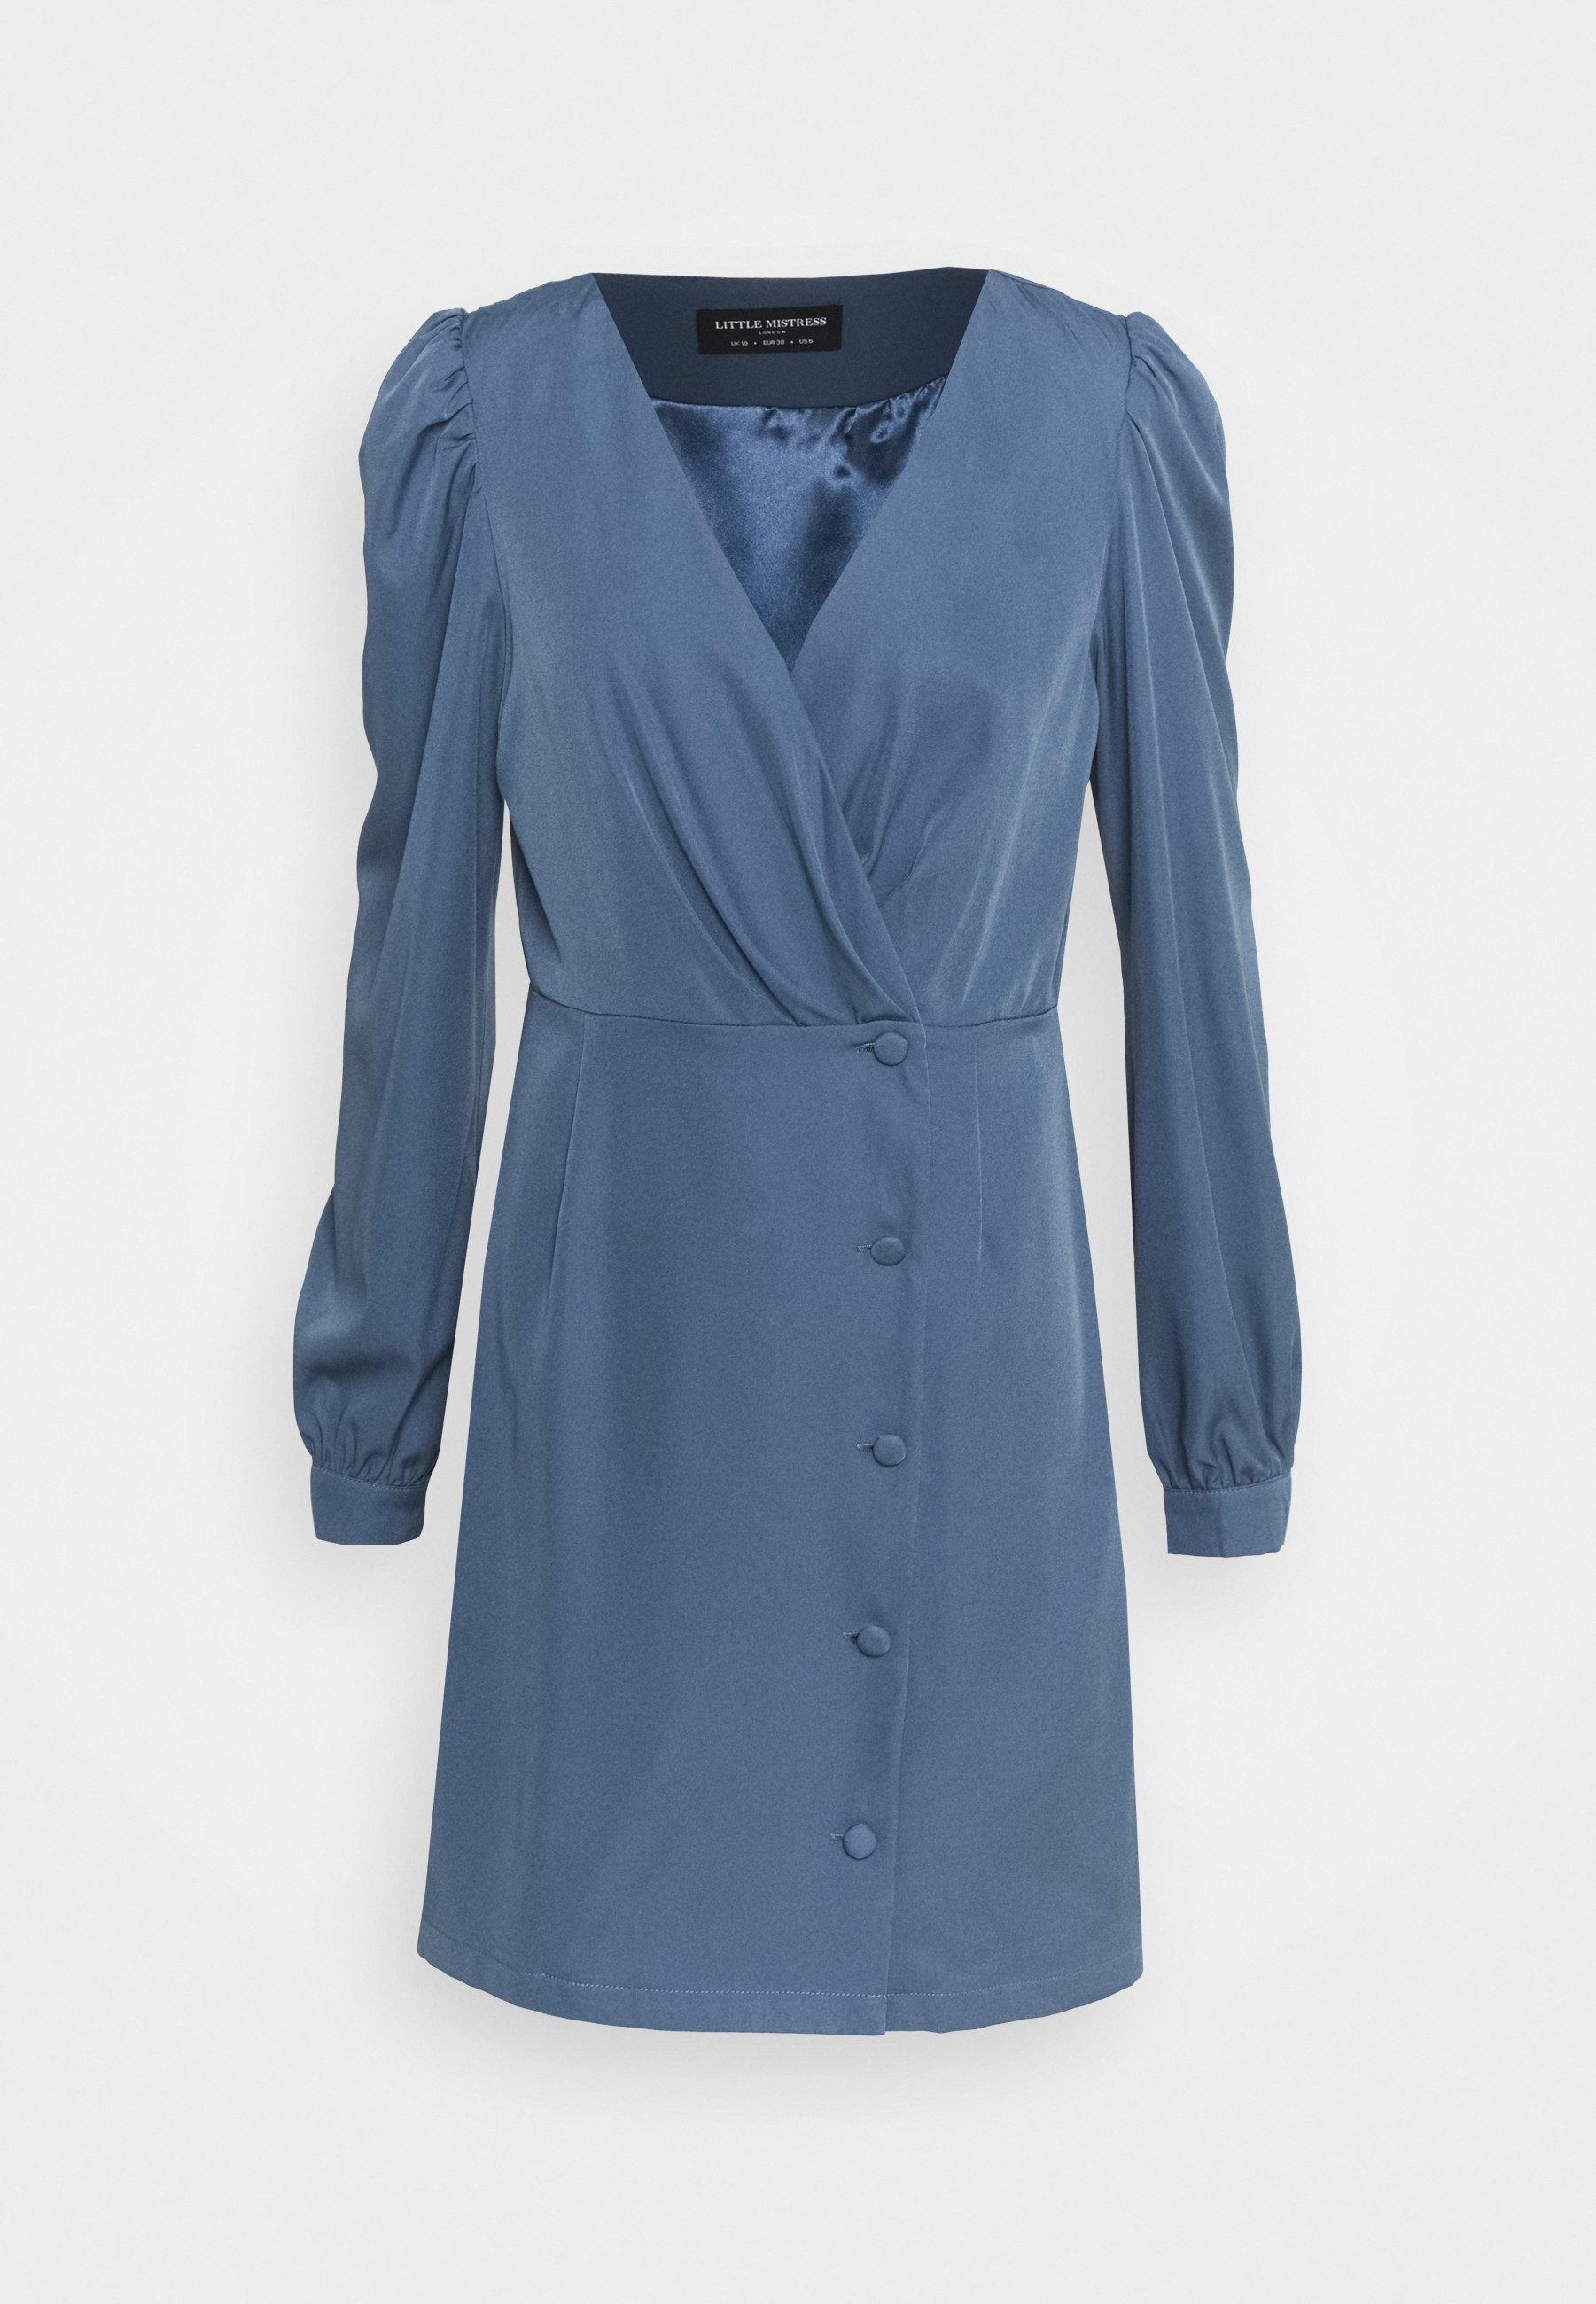 Jolie été Basic Robe Taille 54//56 Jersey Robe Shirt Robe Cotton Royal Bleu